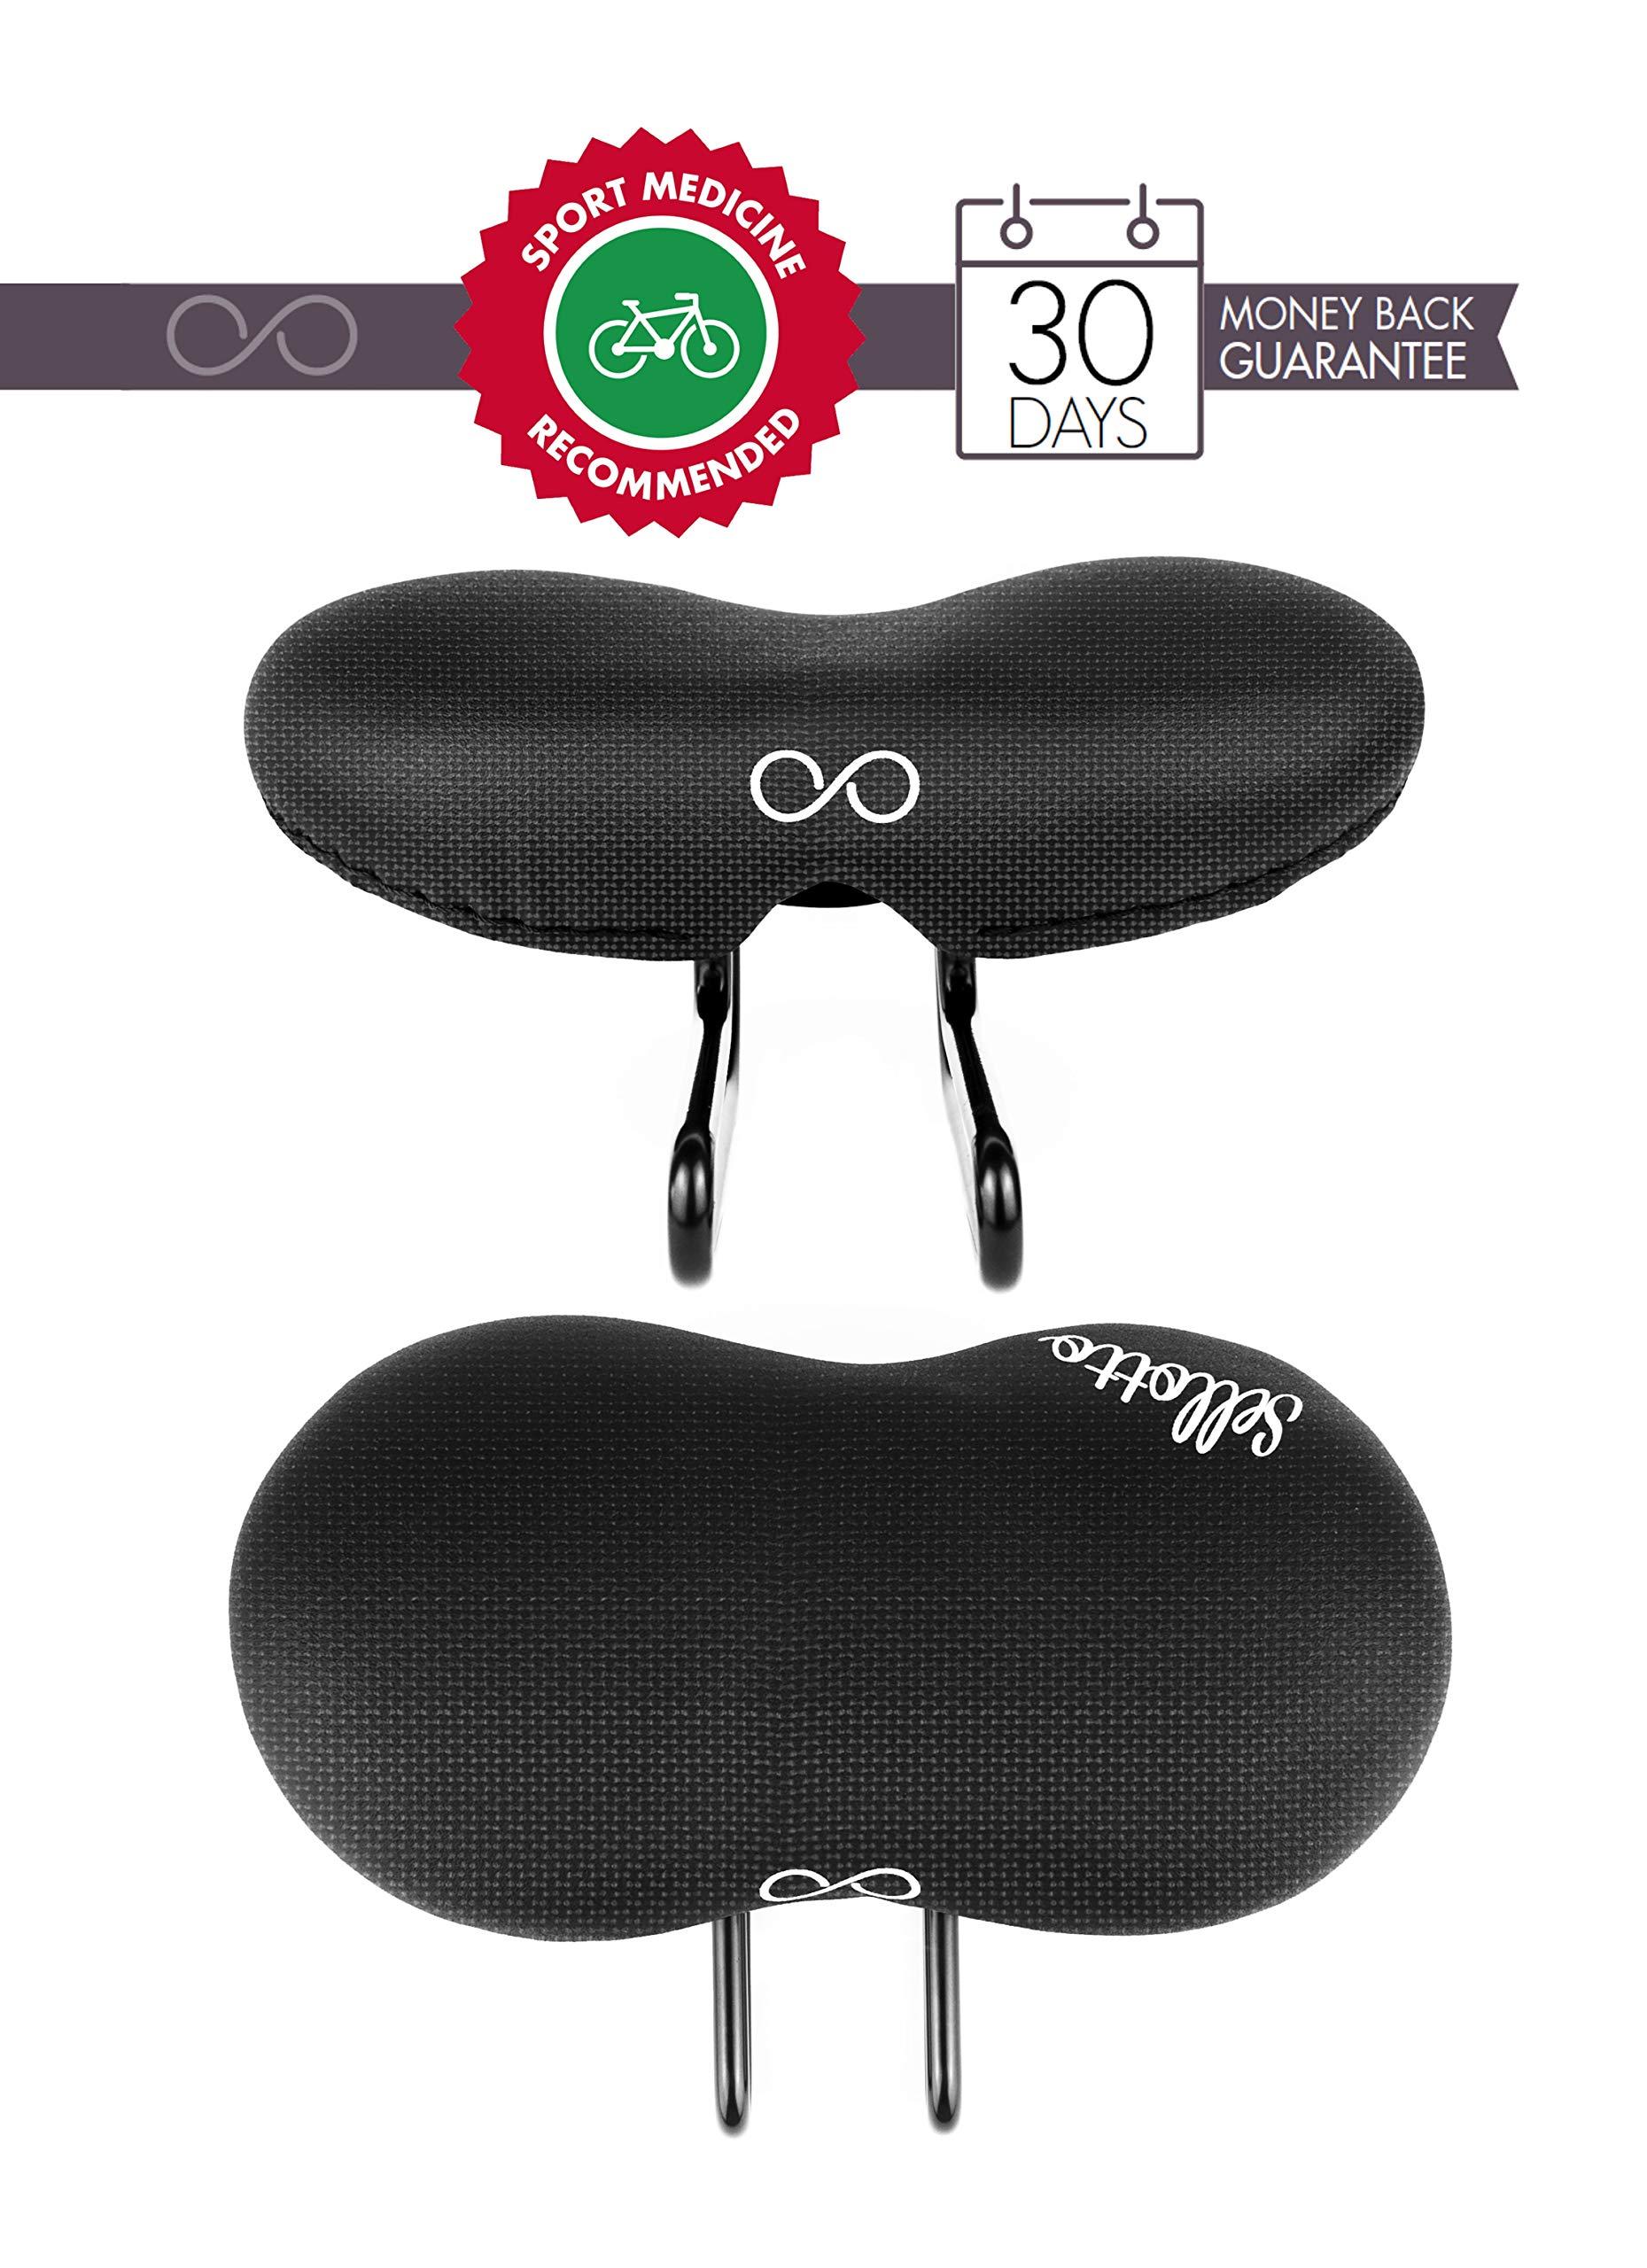 sellOttO Condor - Innovador sillín Acolchado Gel, Recomendado por Medicina Deportiva - Ideal para Bicicleta Ciutad, E-Bike, Mountainbike, Carrera: Amazon.es: Deportes y aire libre